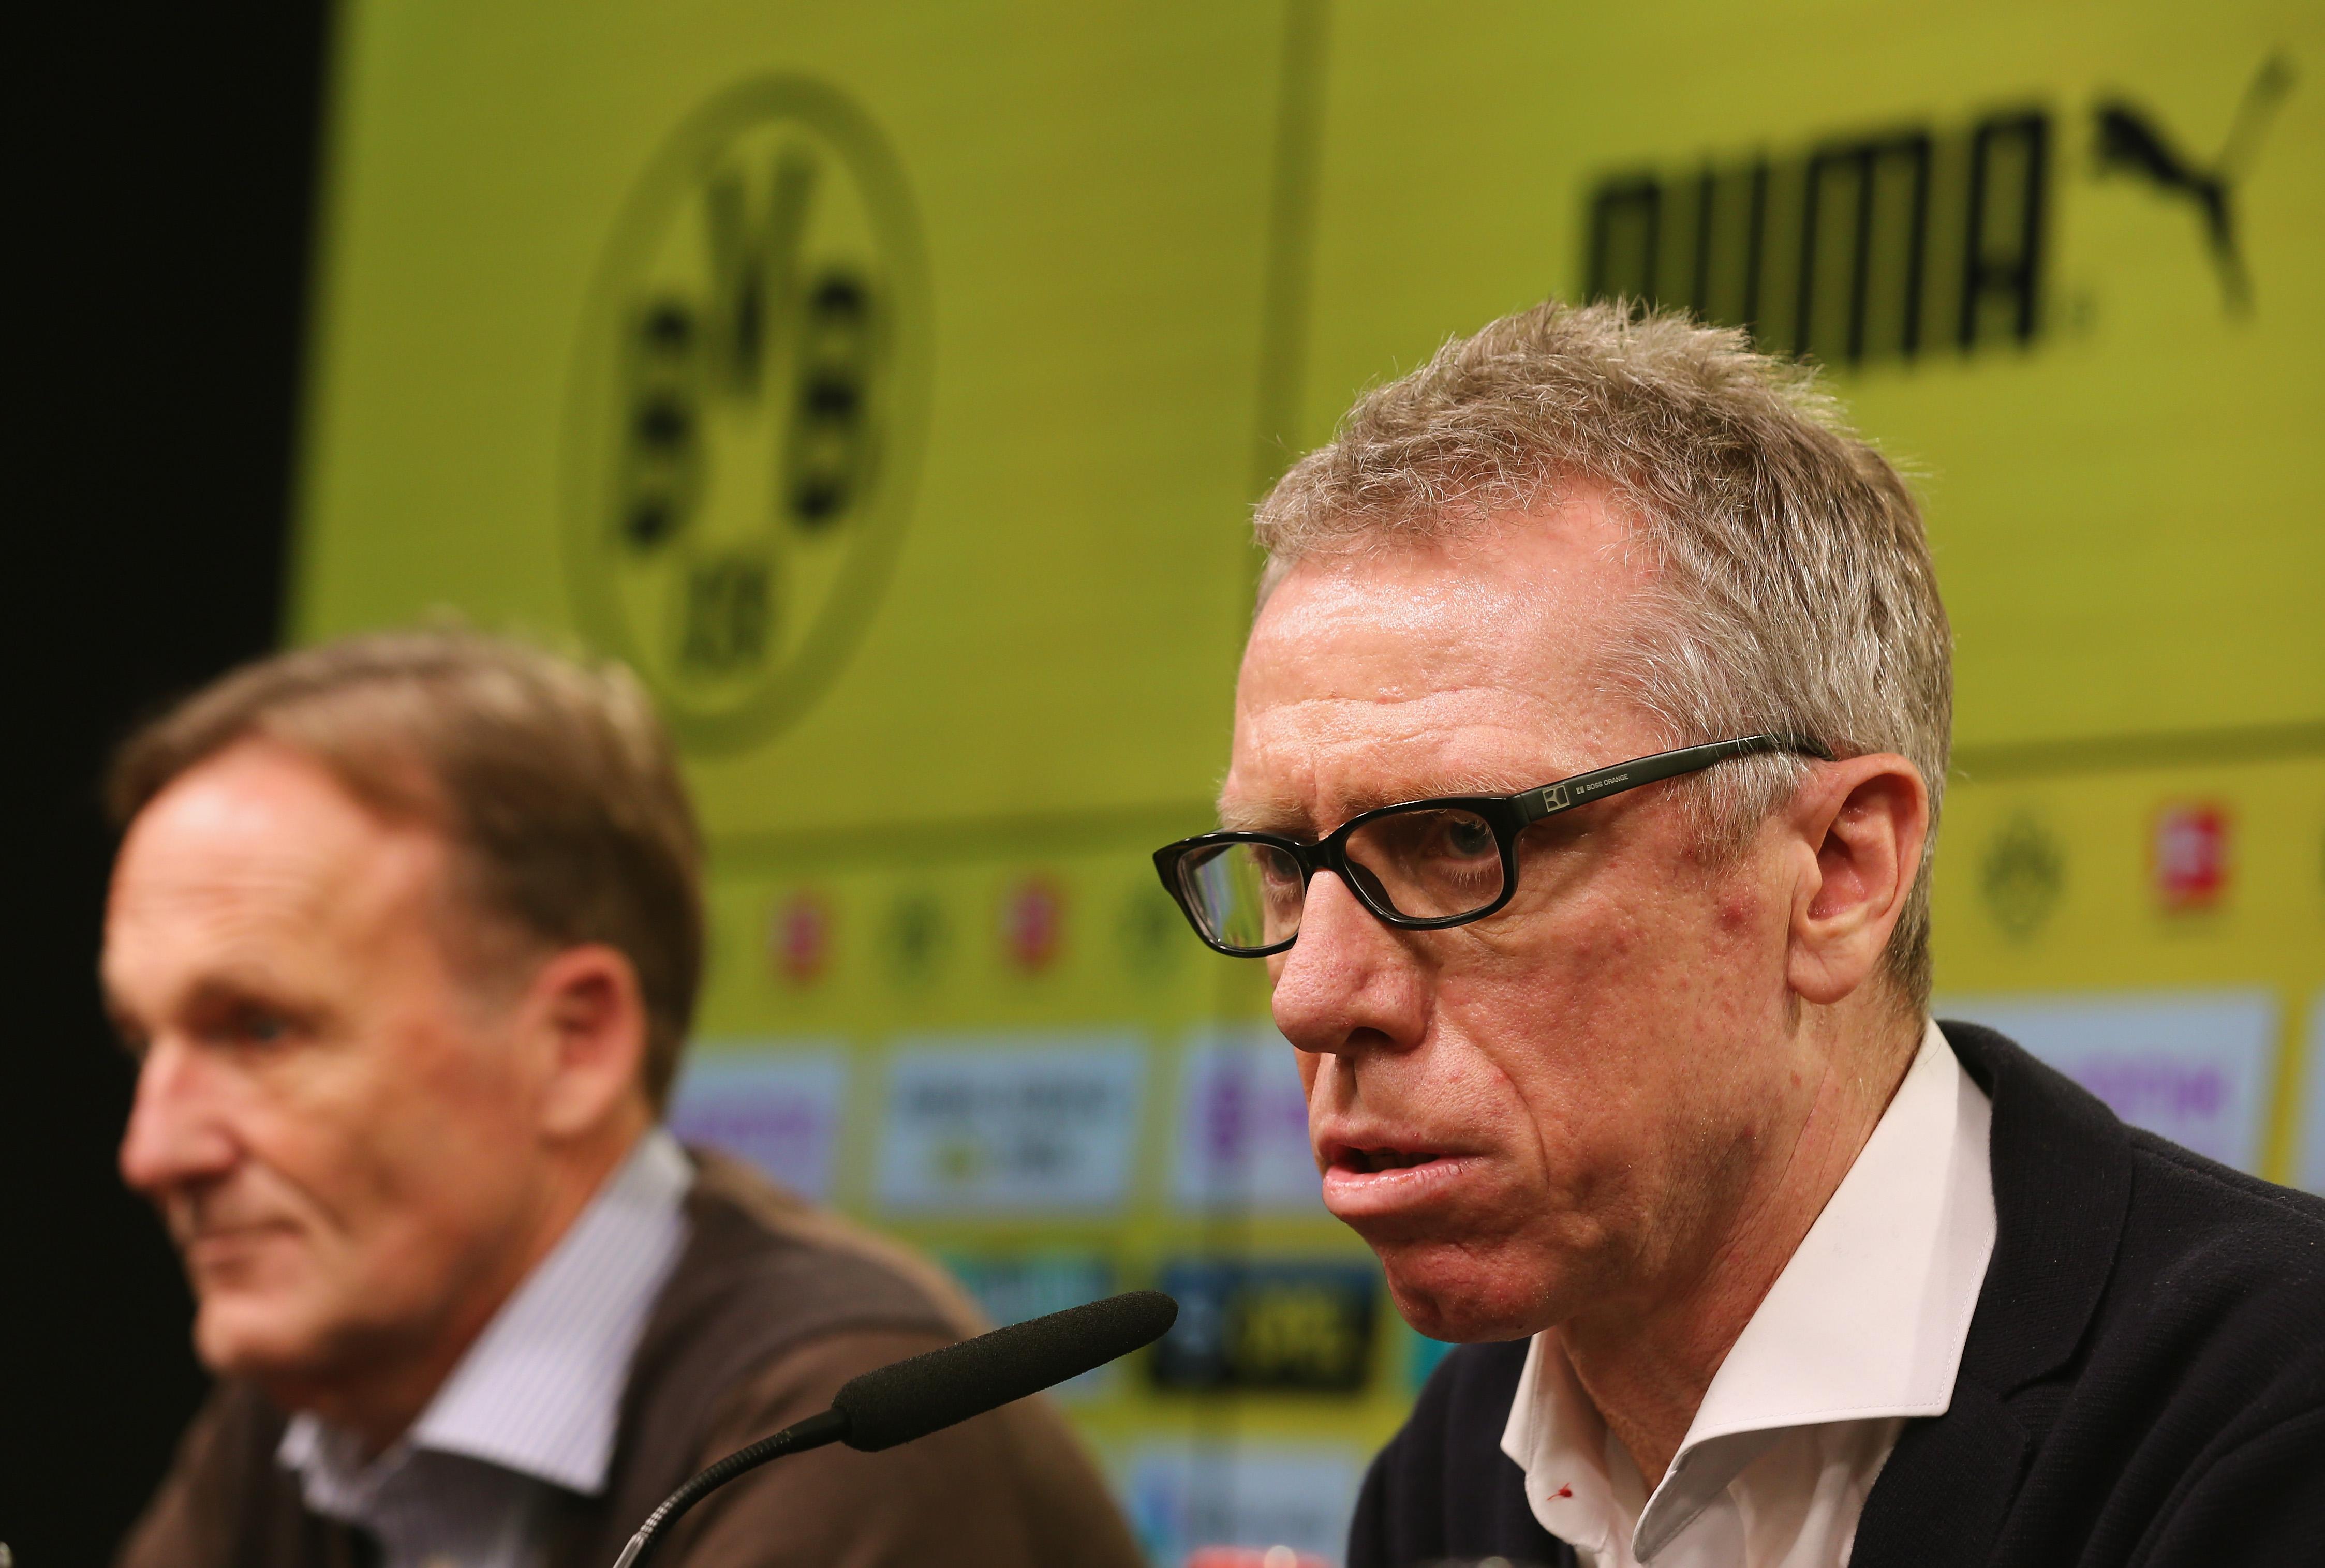 Hans Joachim-Watzke Peter Stöger Borussia Dortmund 12/10/17